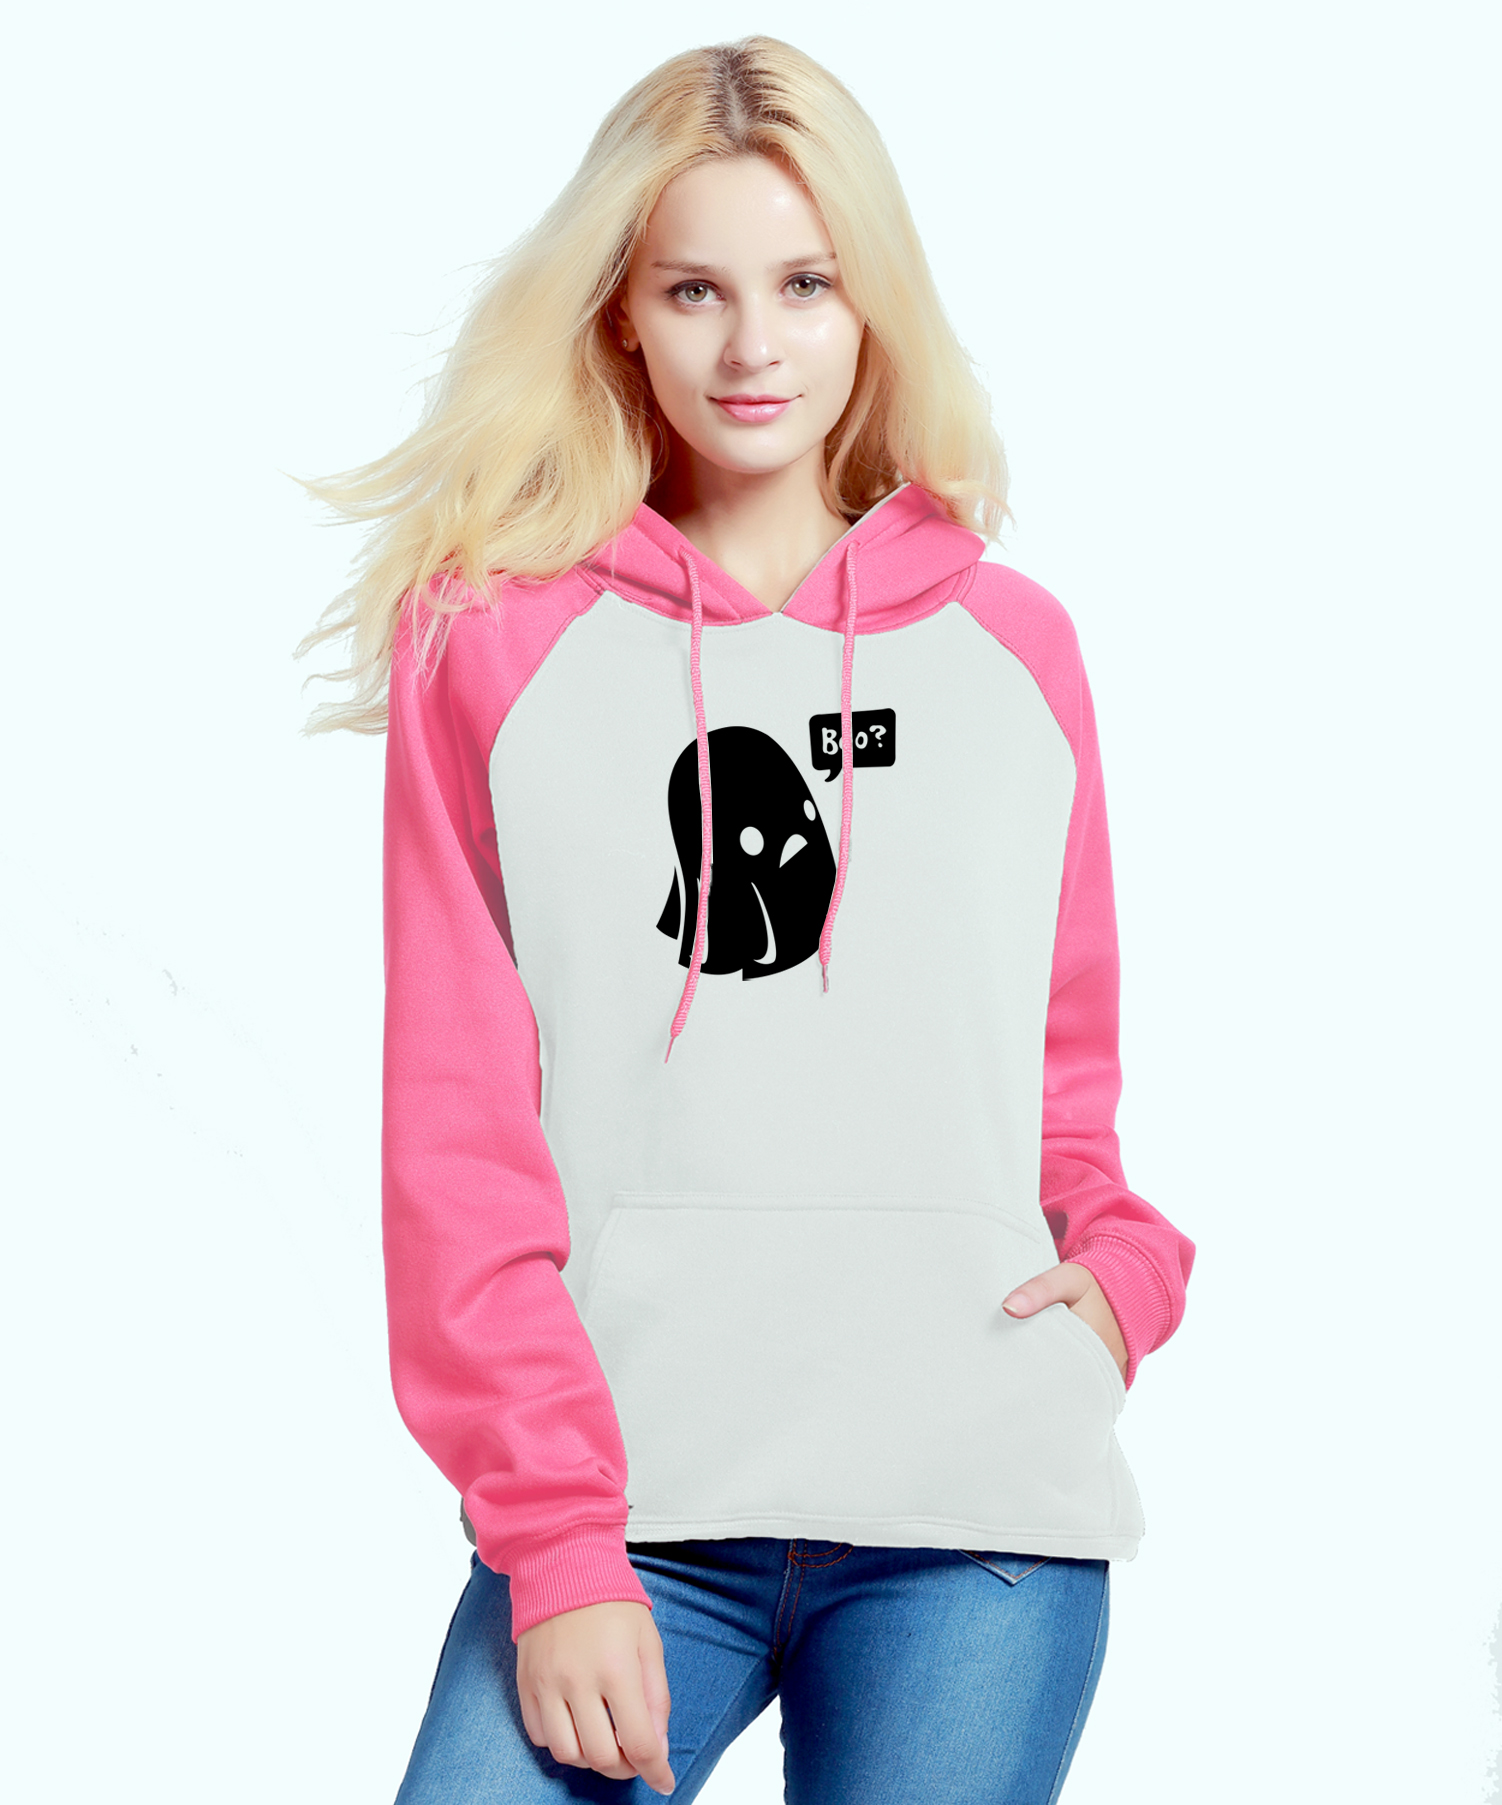 Womens Hoody 2018 New Fashion Sweatshirts Autumn Winter Slim Raglan Hoodies Ghost Boo Halloween Print Hip Hop Streetwear Kpop